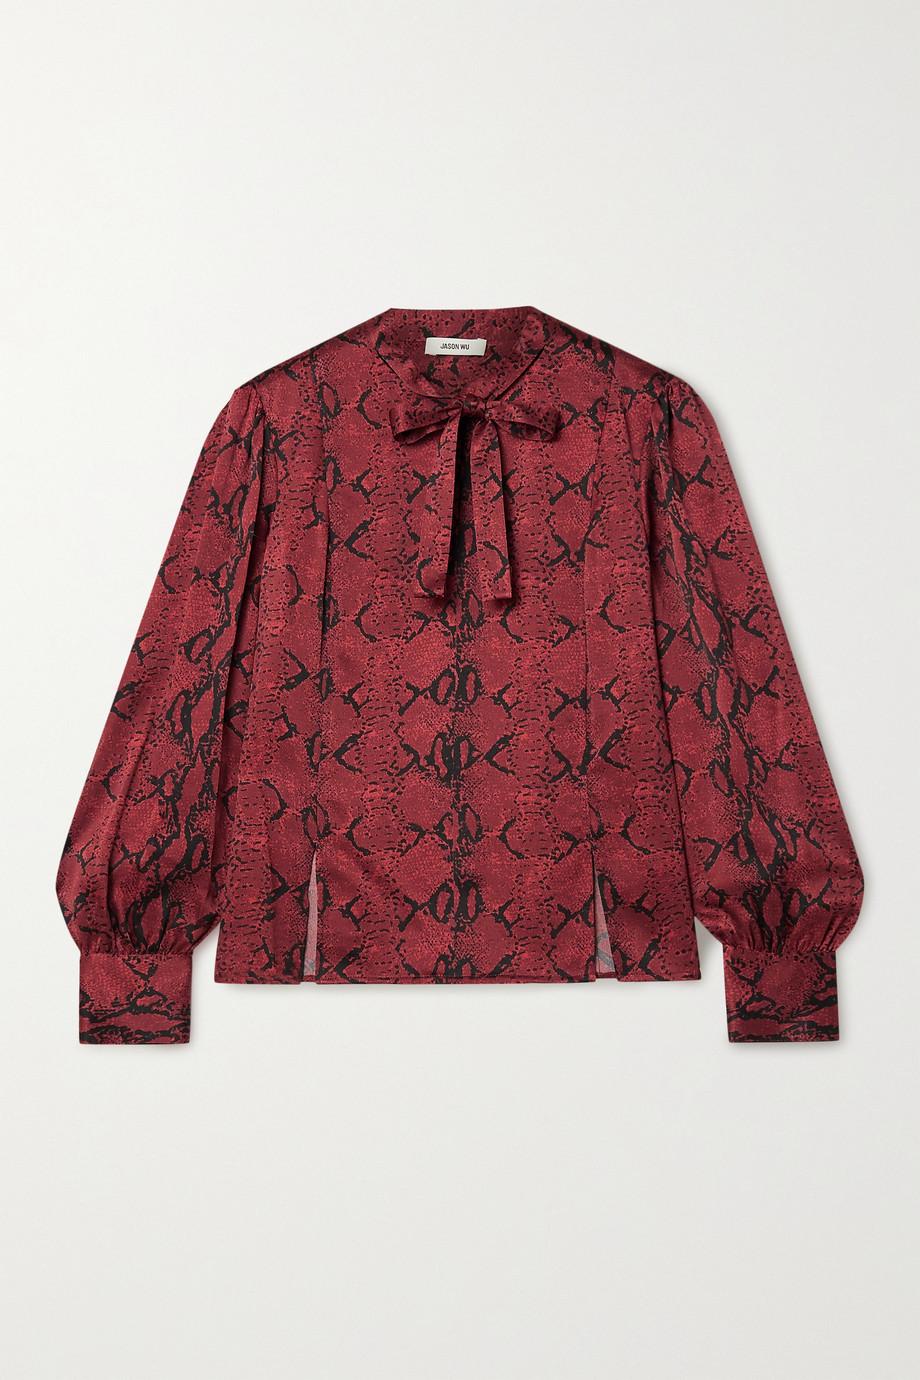 Jason Wu Pussy-bow snake-print silk-crepe blouse